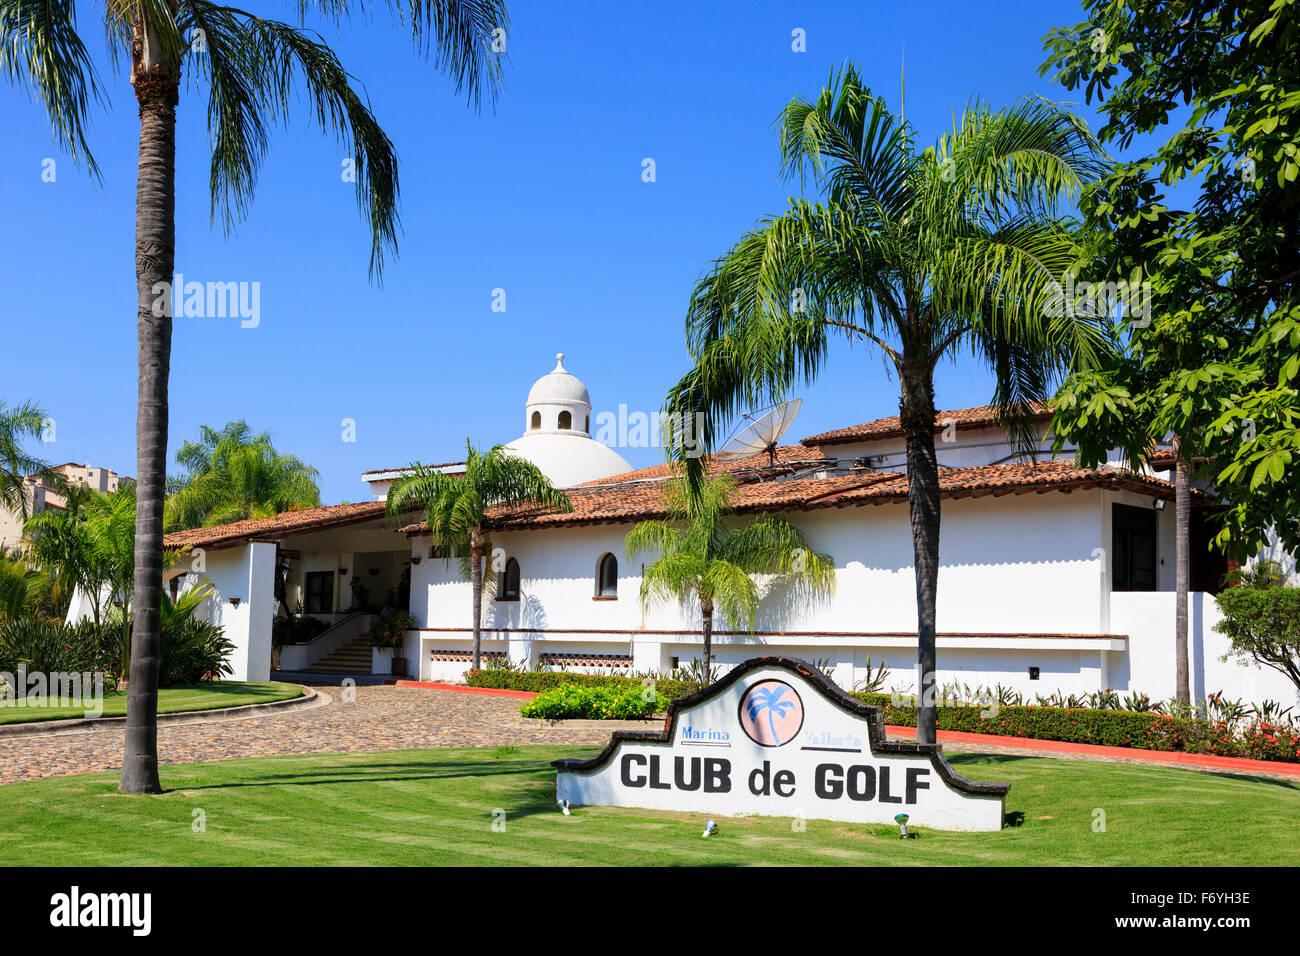 Clubhouse of Marina Vallarta Golf Club, Puerto Vallarta, Mexico - Stock Image